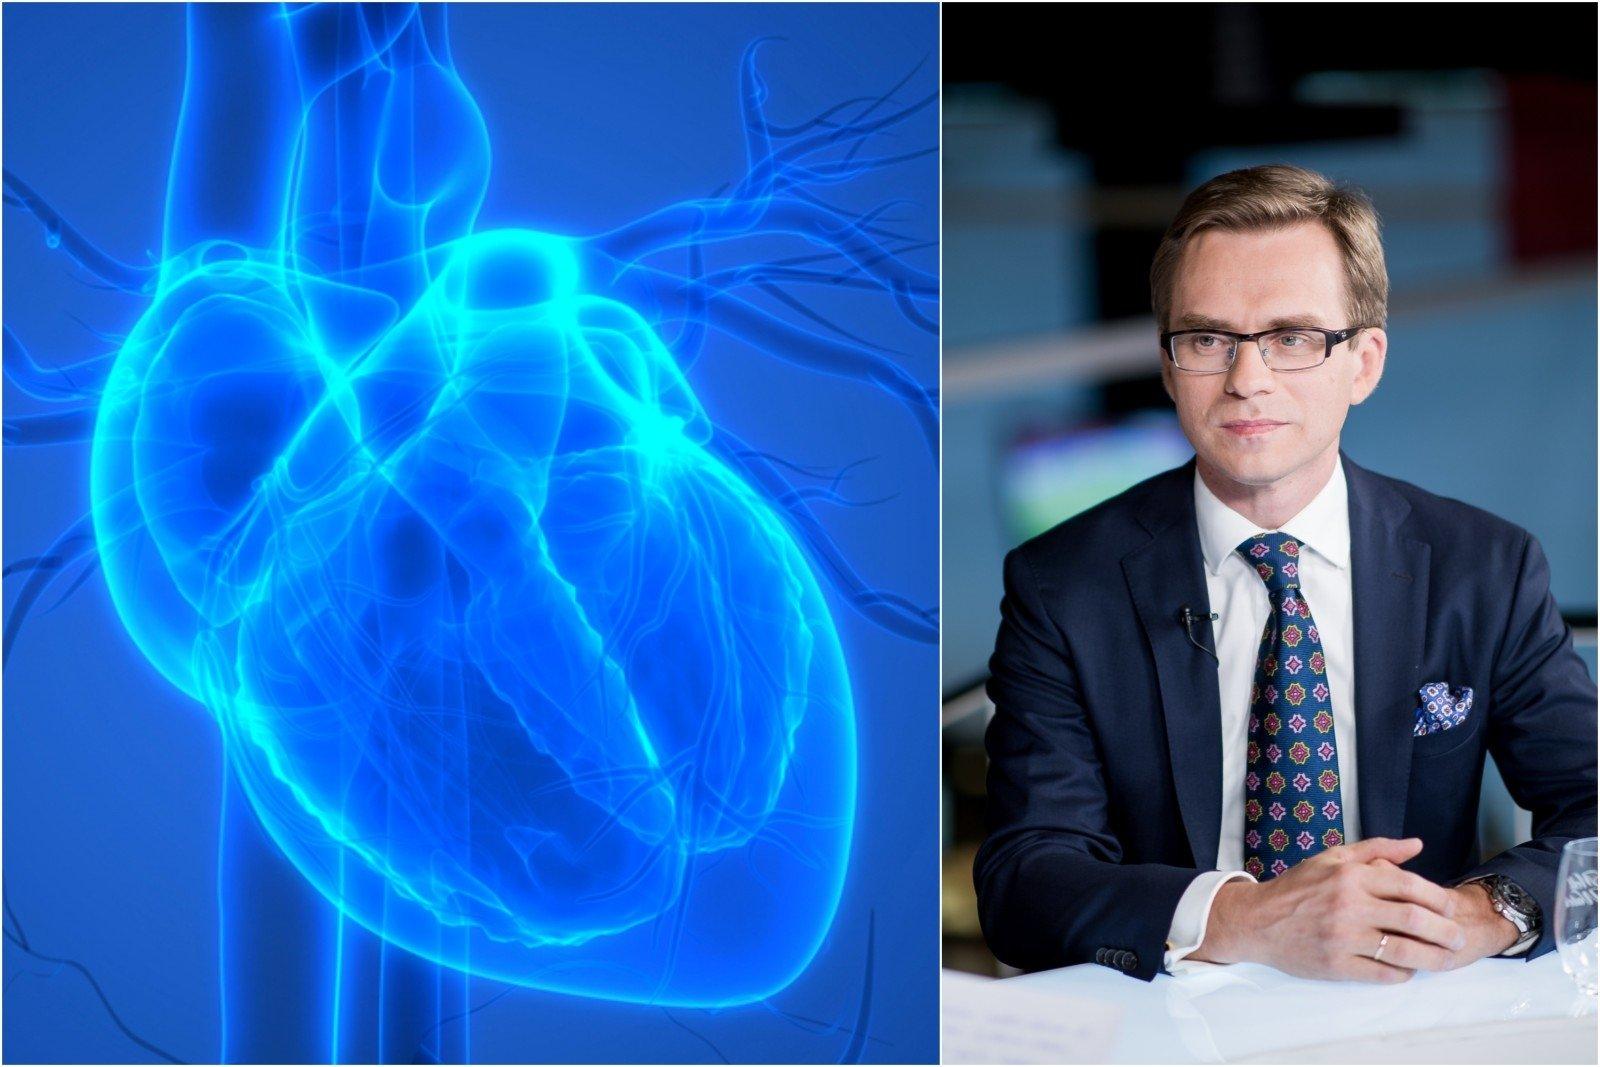 hipertenzijos gydymas gudobelėmis